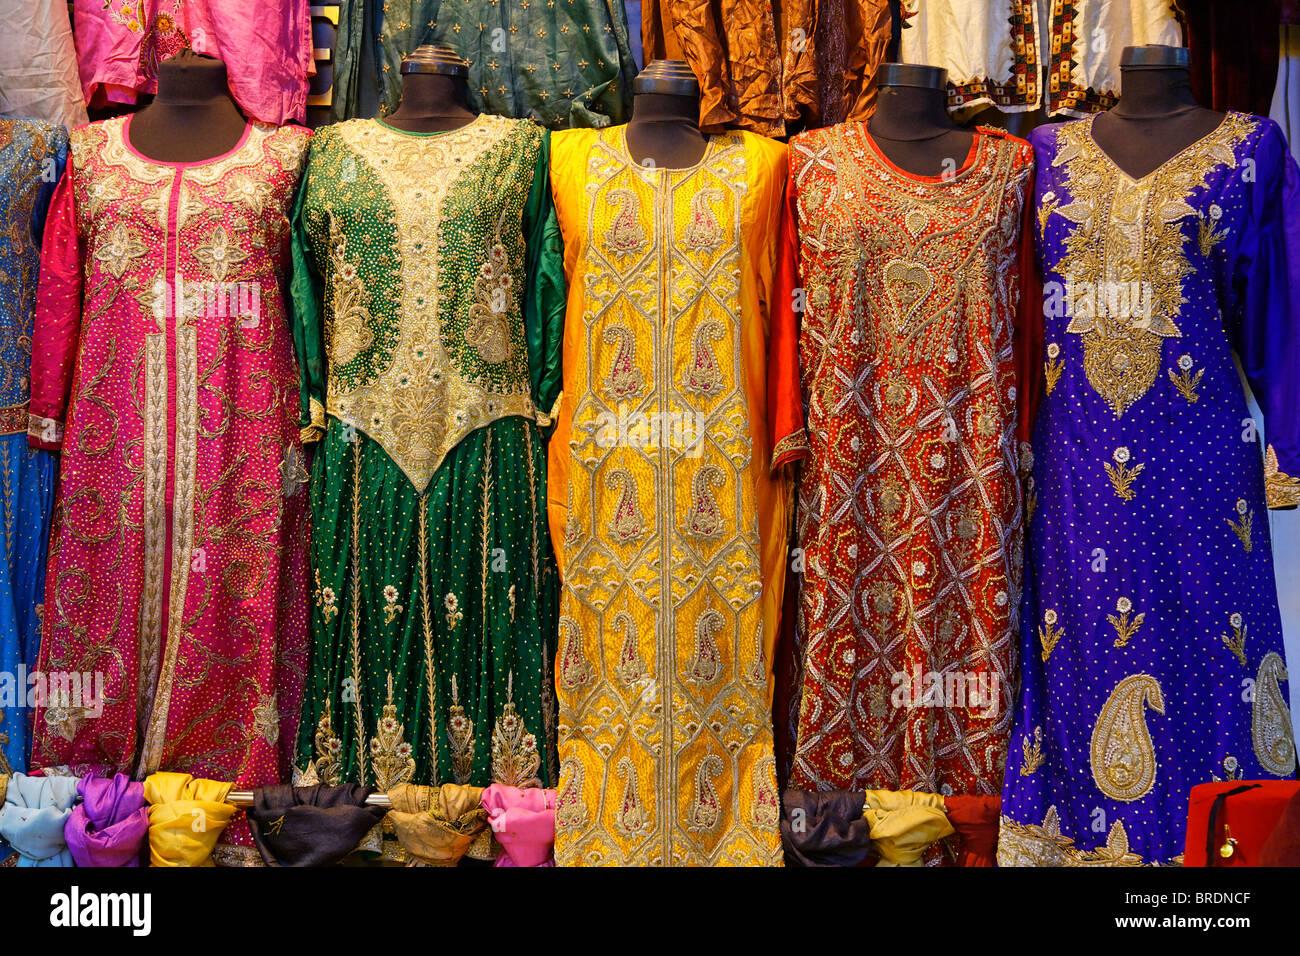 Shop display of dresses inside the Grand Bazaar, Istanbul ...